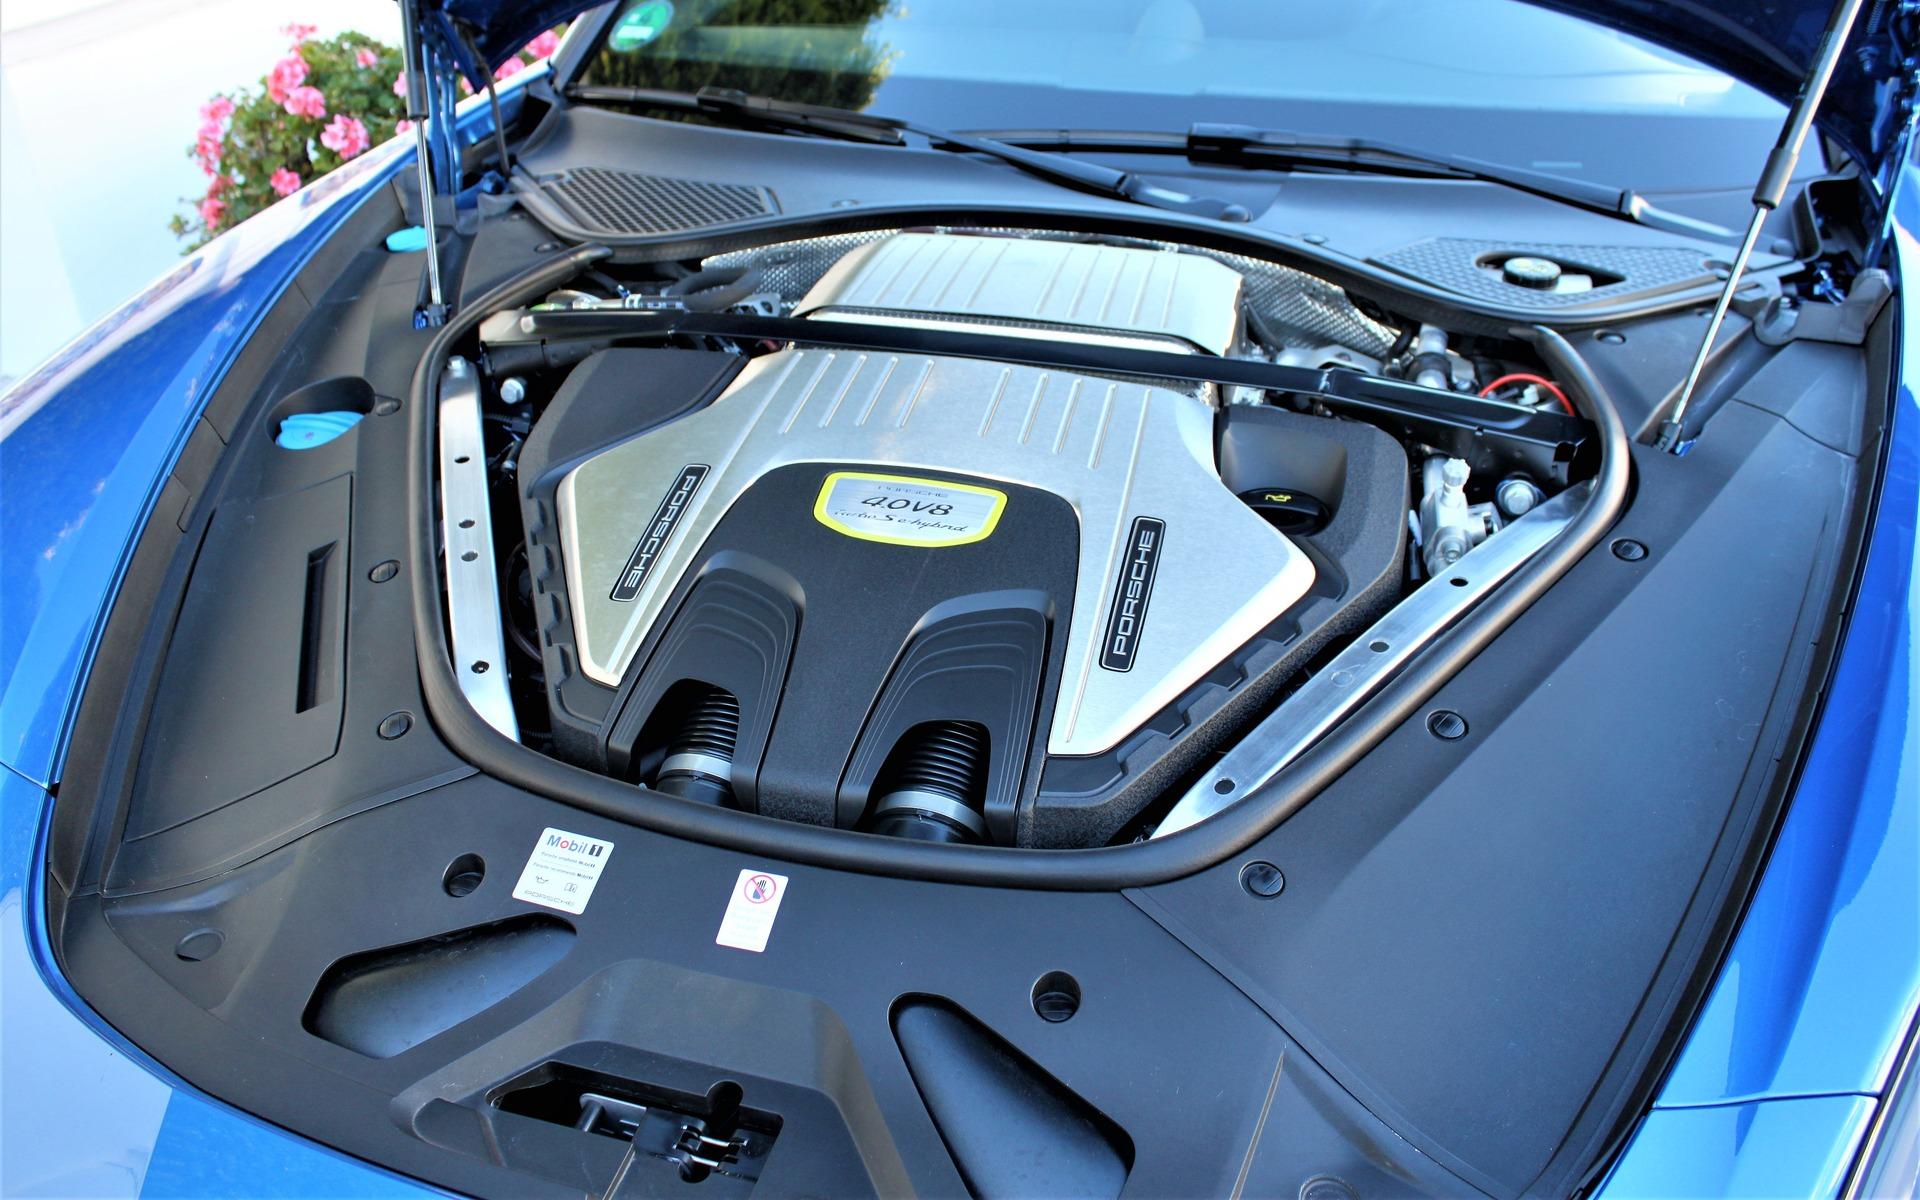 2018 Porsche Panamera Turbo S E Hybrid Sport Turismo Green Porsche Power 9 20